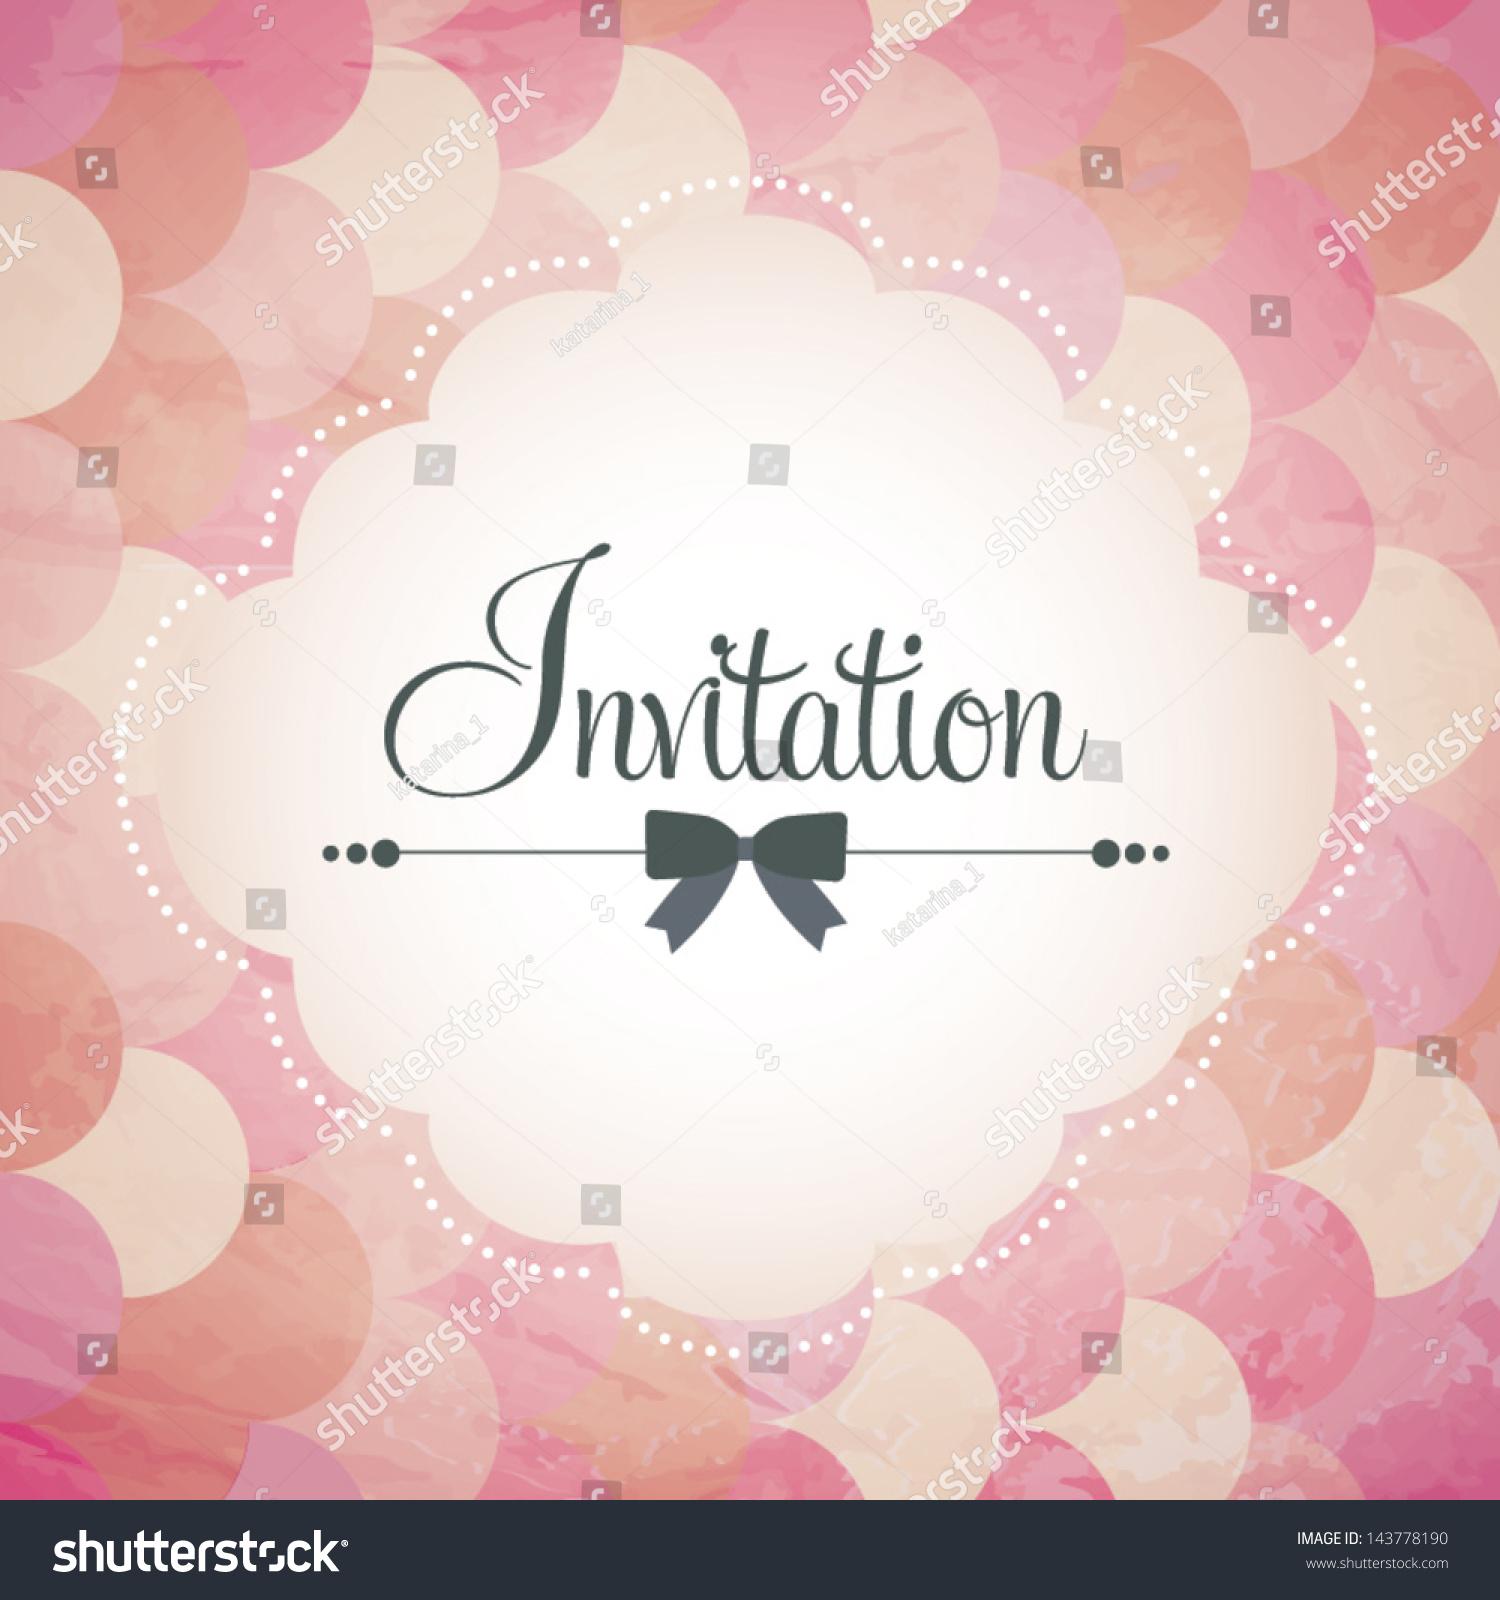 Vector Illustration Wedding Invitation Card Seamless Stock Vector ...